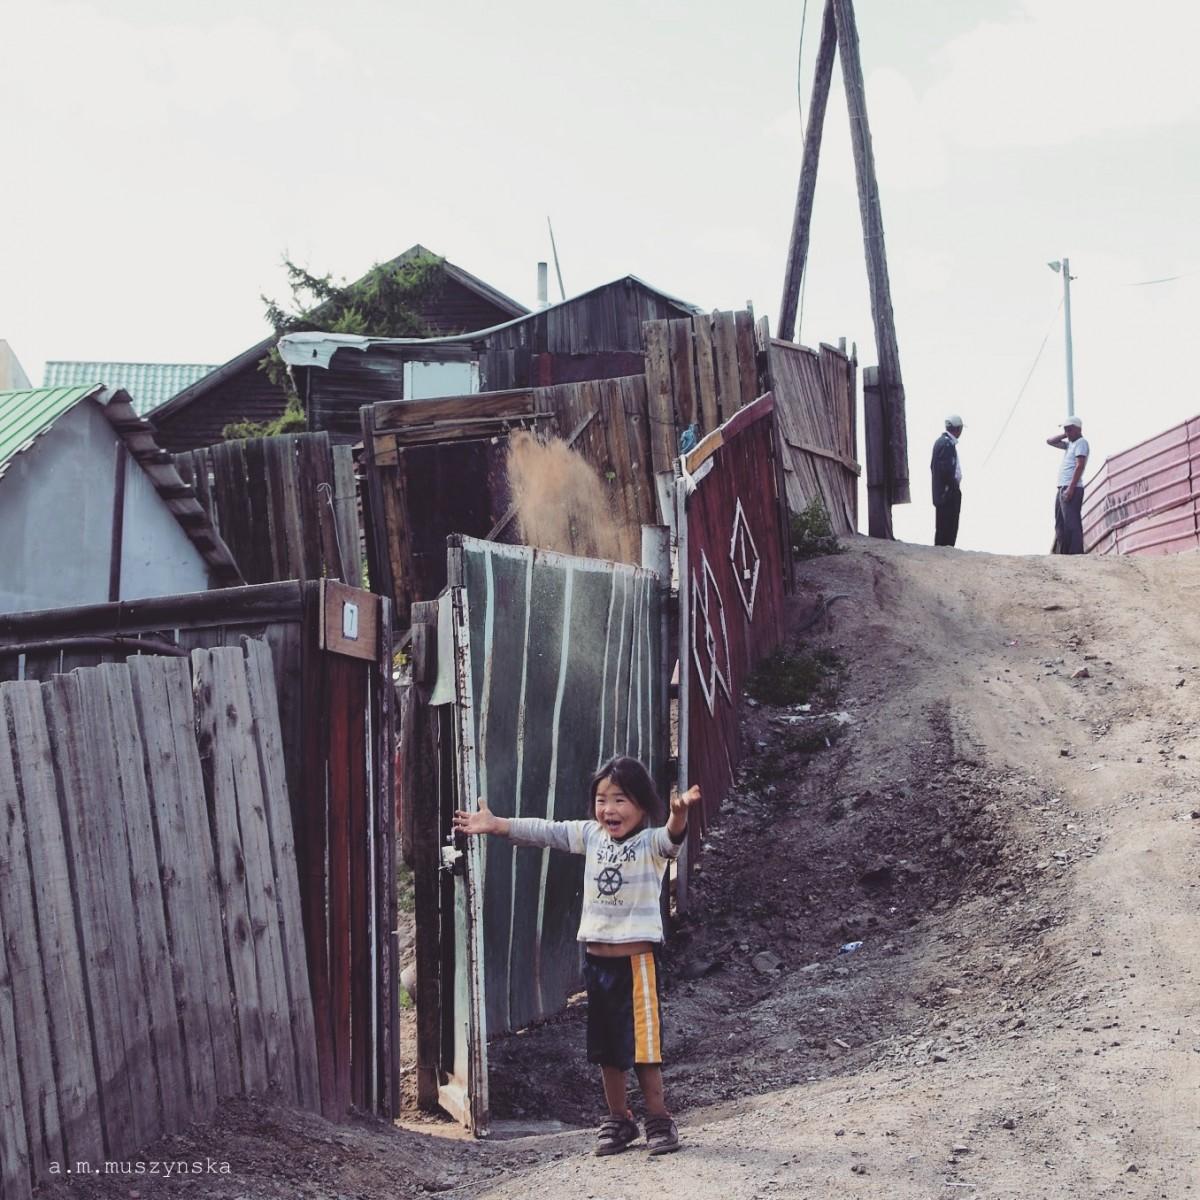 Zdjęcia: Ułan Bator, Ułan Bator, Radość, MONGOLIA